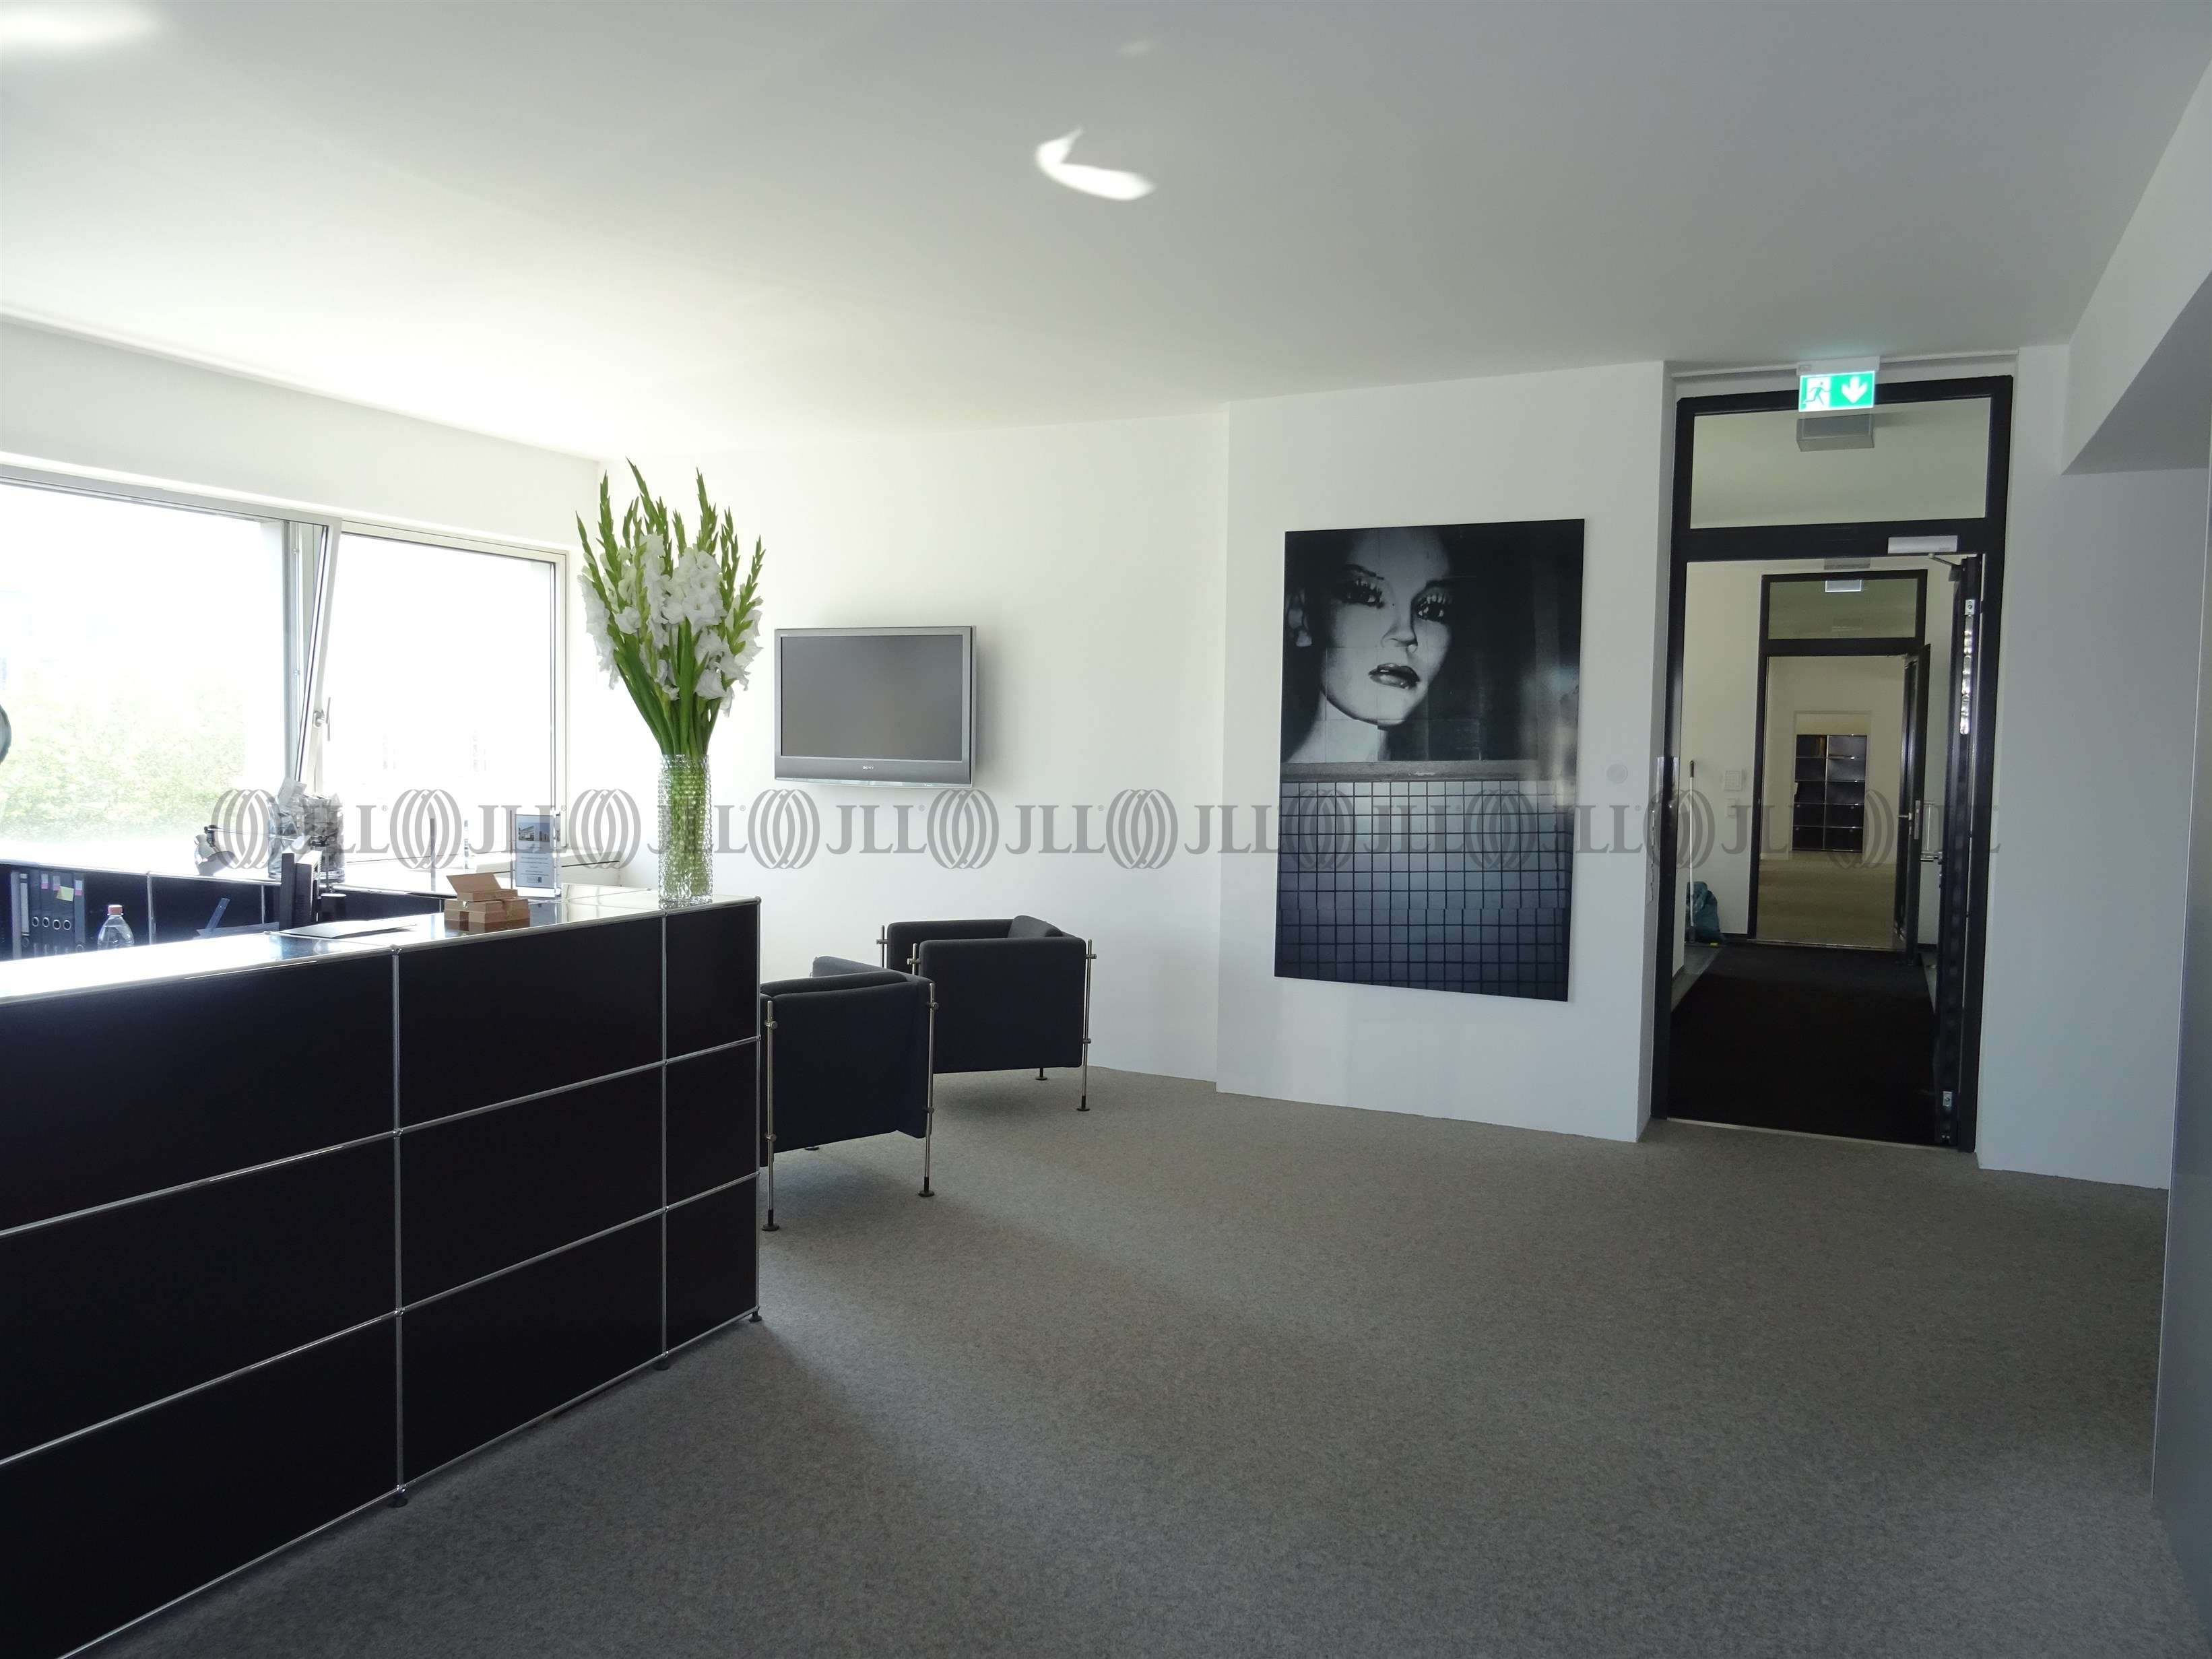 Büros Darmstadt, 64283 - Büro - Darmstadt - F1118 - 10057709